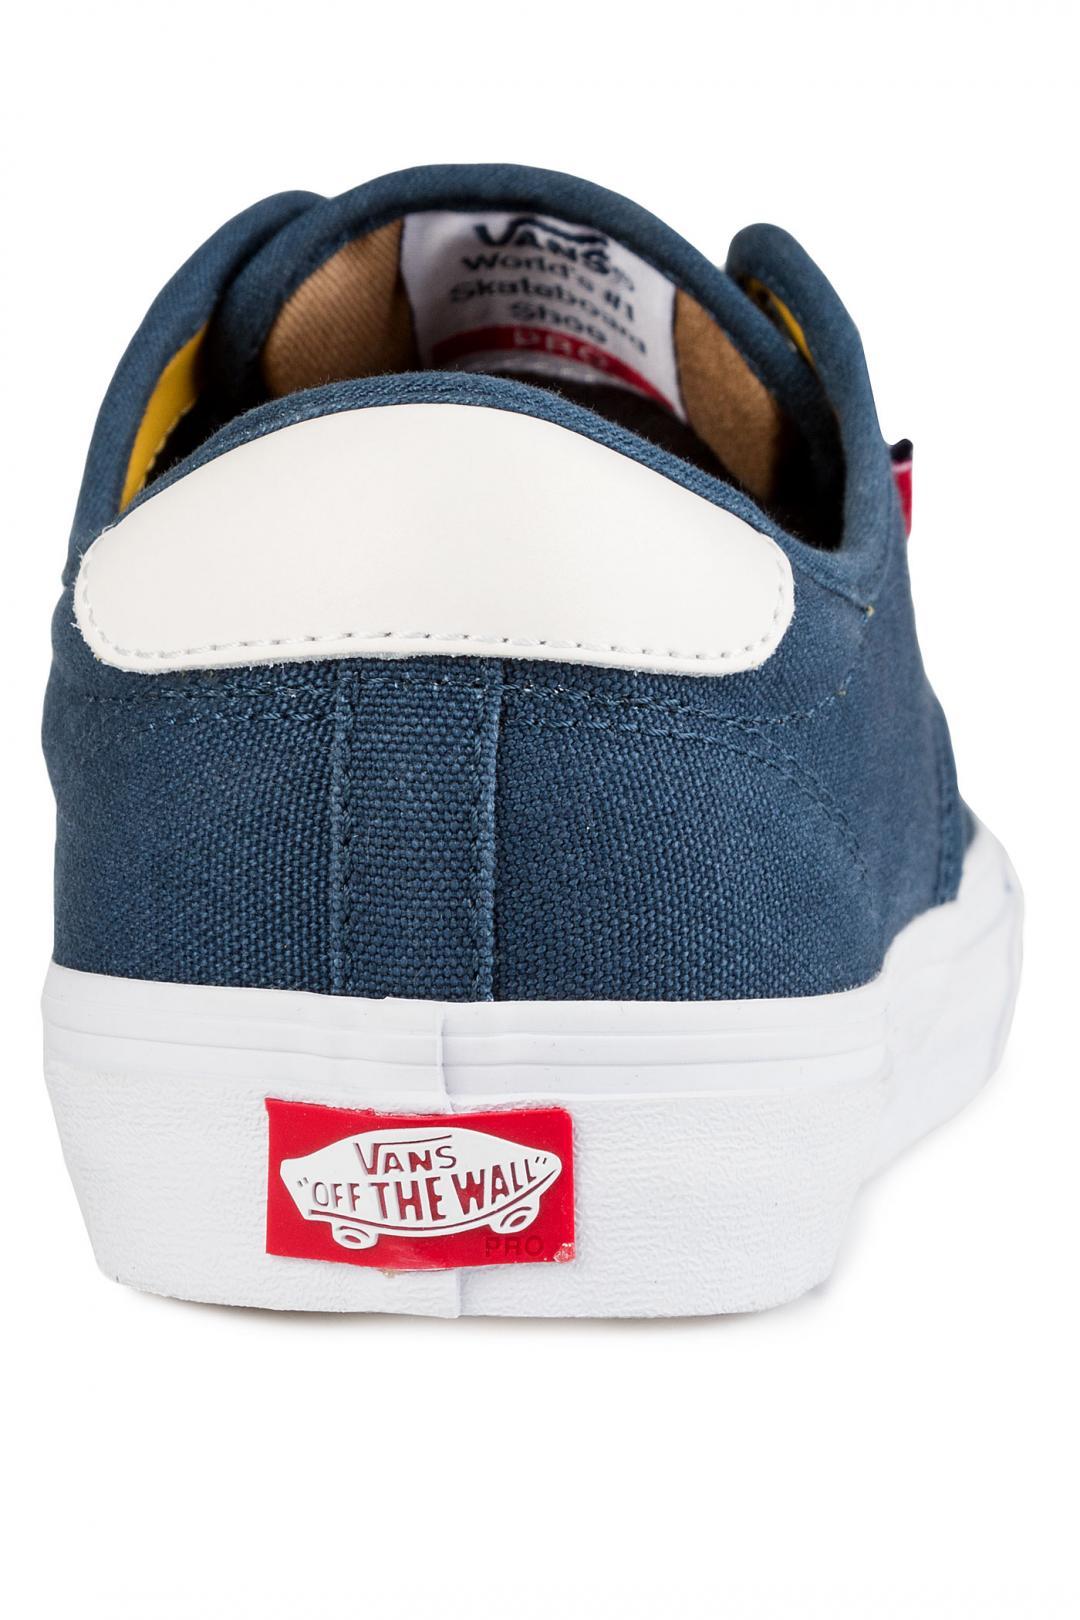 Uomo Vans Chima Ferguson Pro reflecting   Sneakers low top